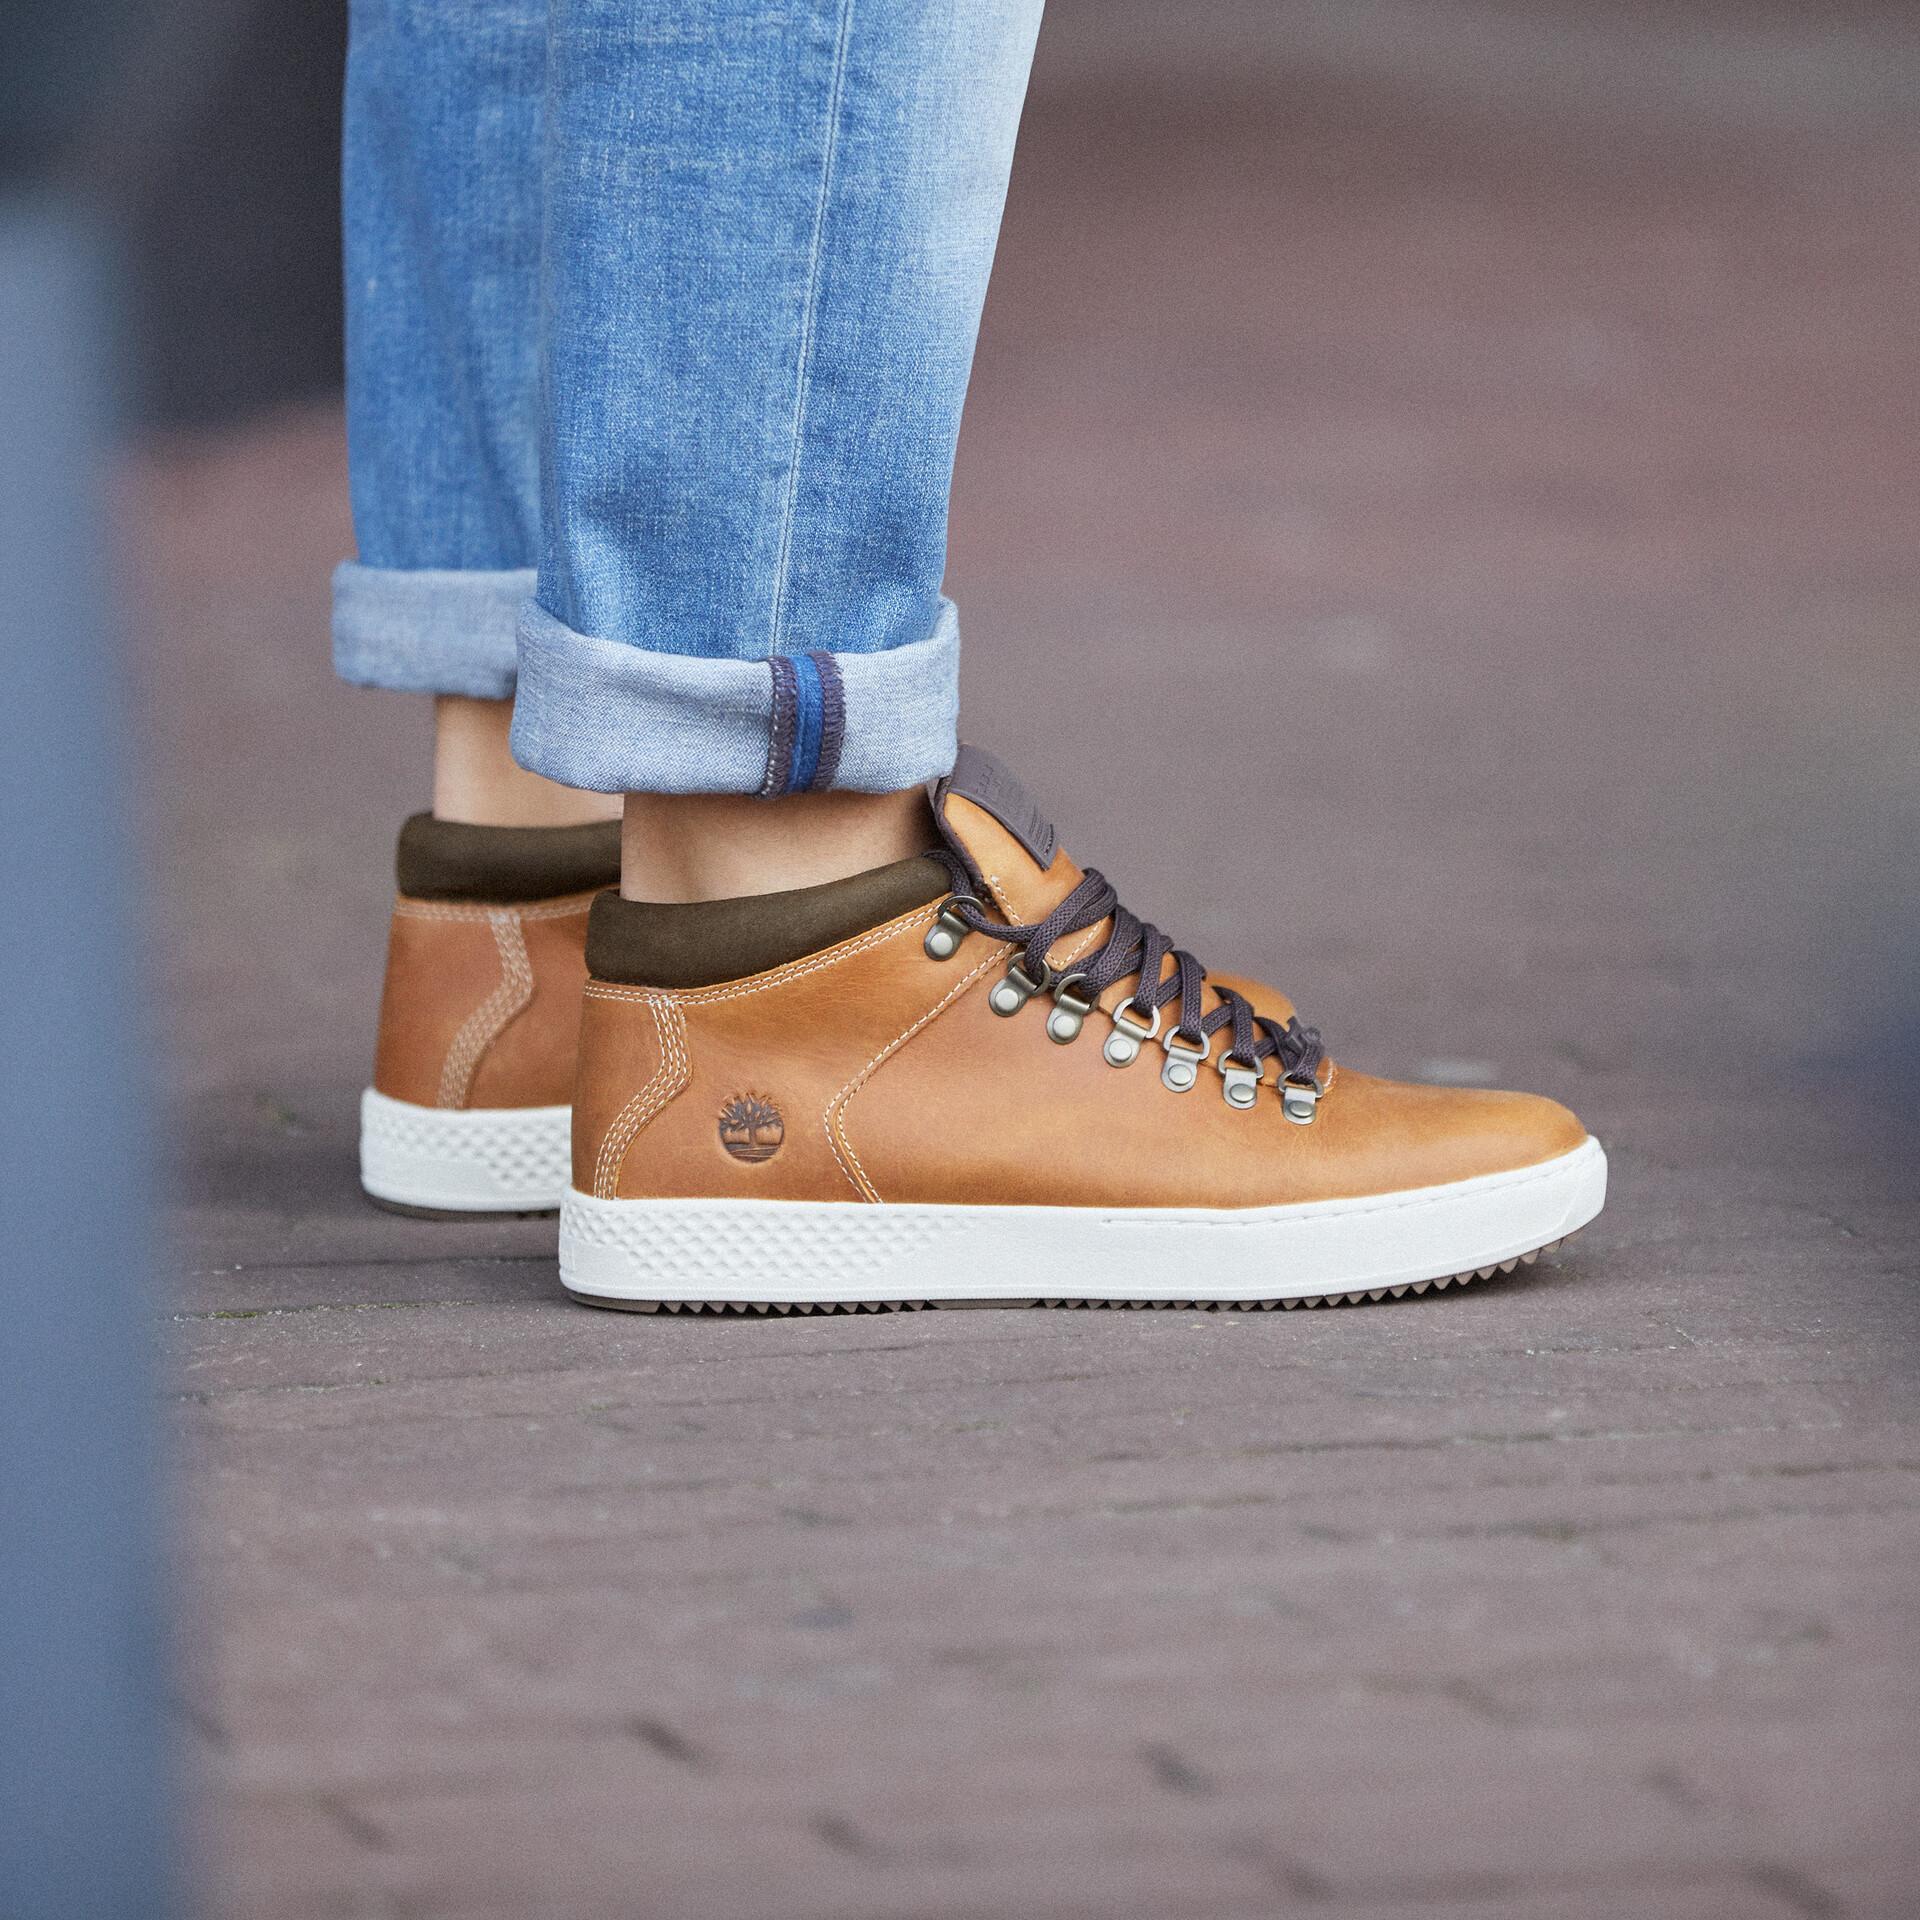 Timberland CityRoam Cupsole Chaussures Chukka Homme, olive full grain